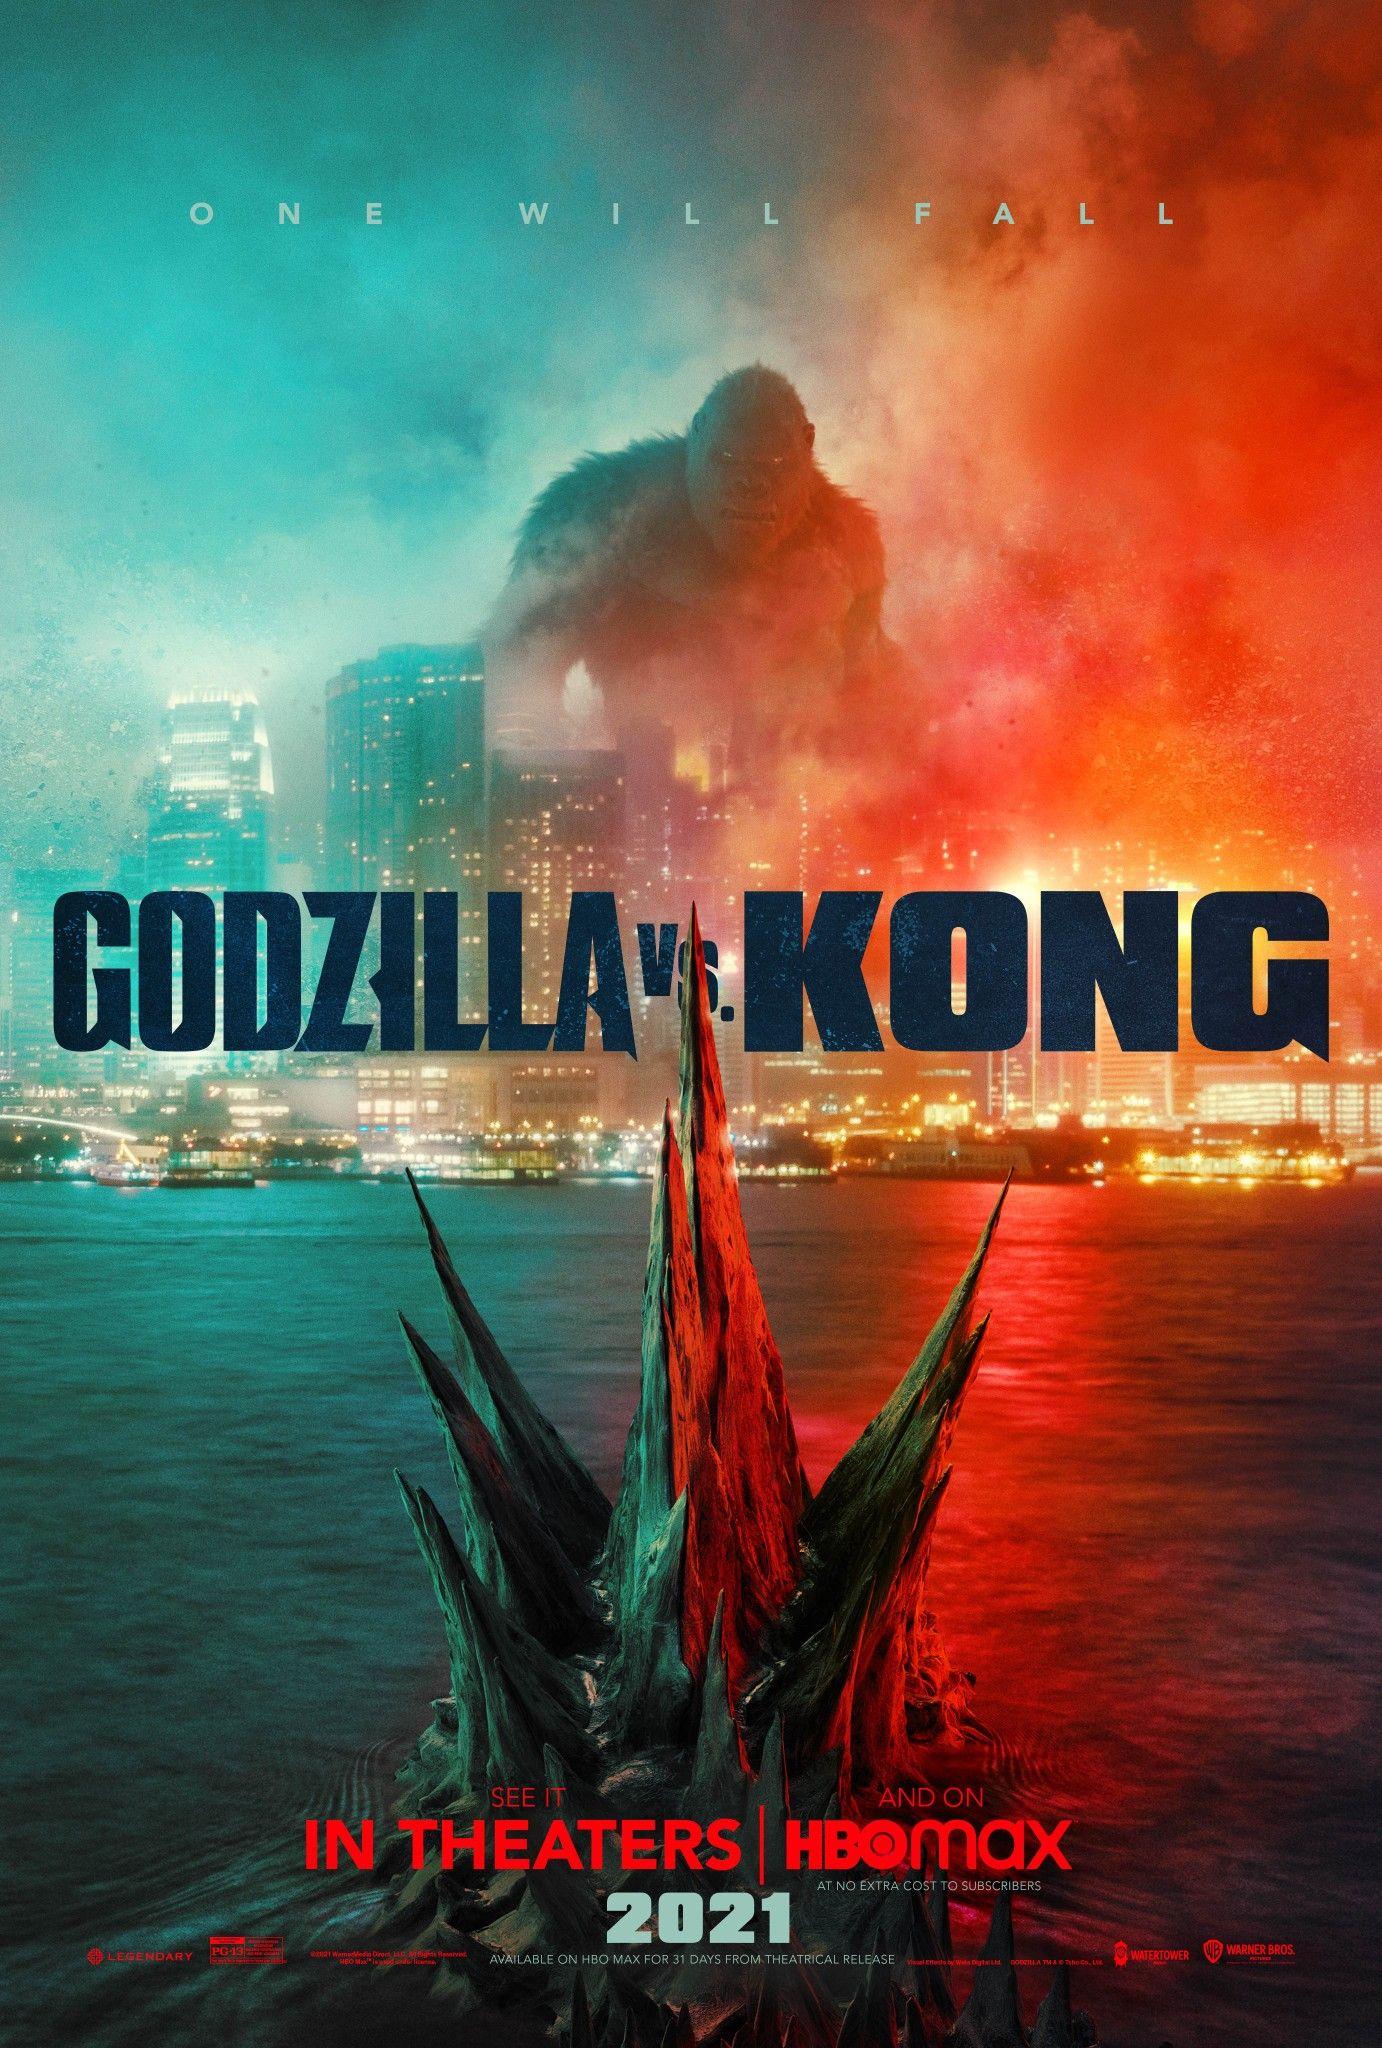 Godzilla Vs Kong Official Poster Trailer Sunday En 2021 Poster De Peliculas Peliculas De Disney Fotos De Marvel